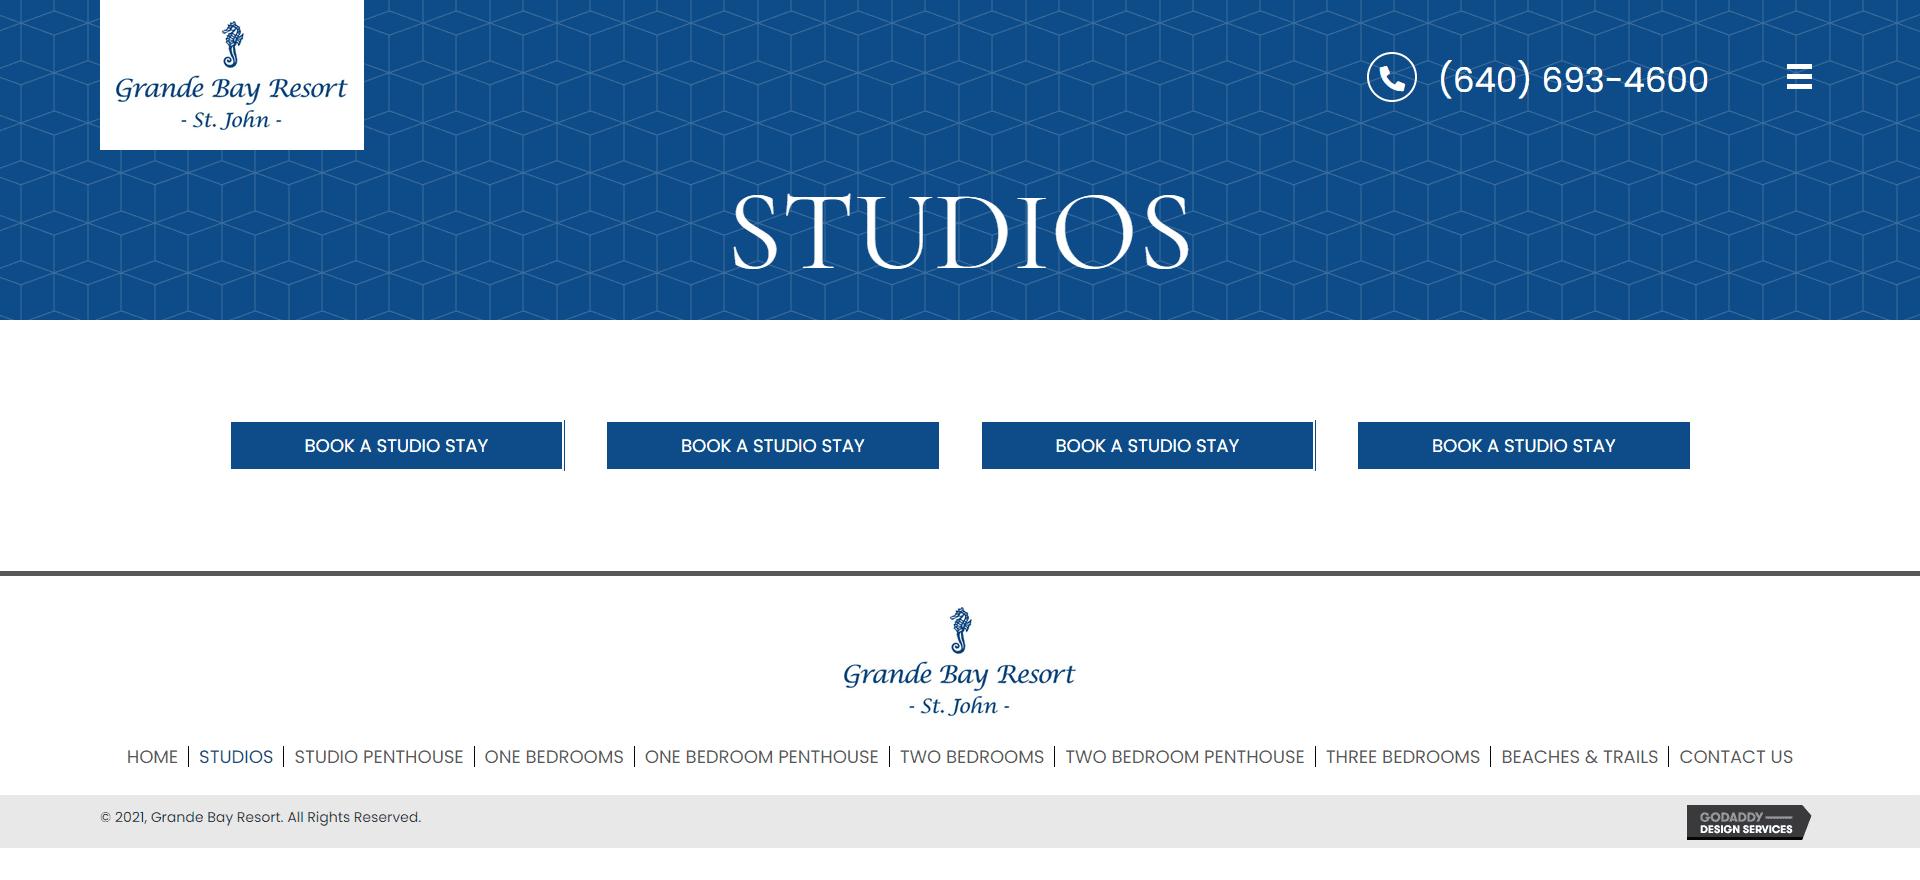 Grande Bay Resort Studios